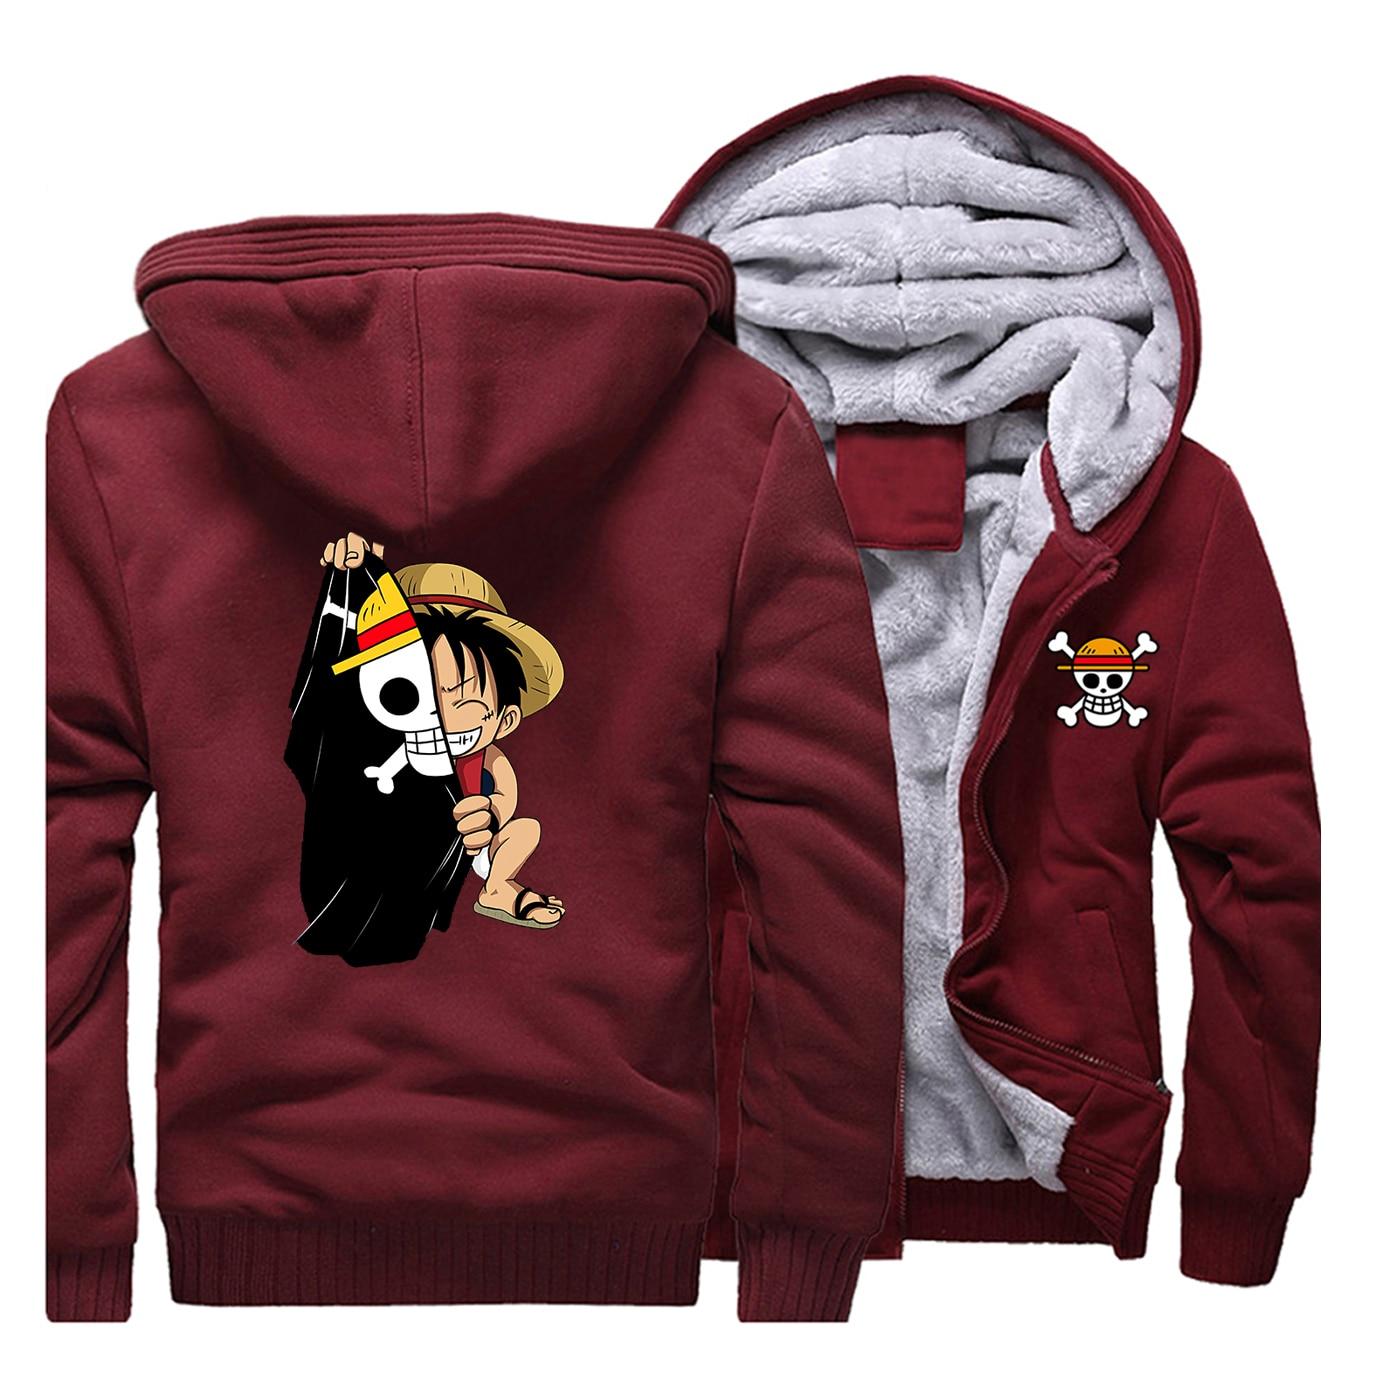 Japanese Anime Luffy Print One Piece Men's Hoodies Streetwear 2019 Winter Warm Sweatshirts Harajuku Coats Outerwear Funny Jacket